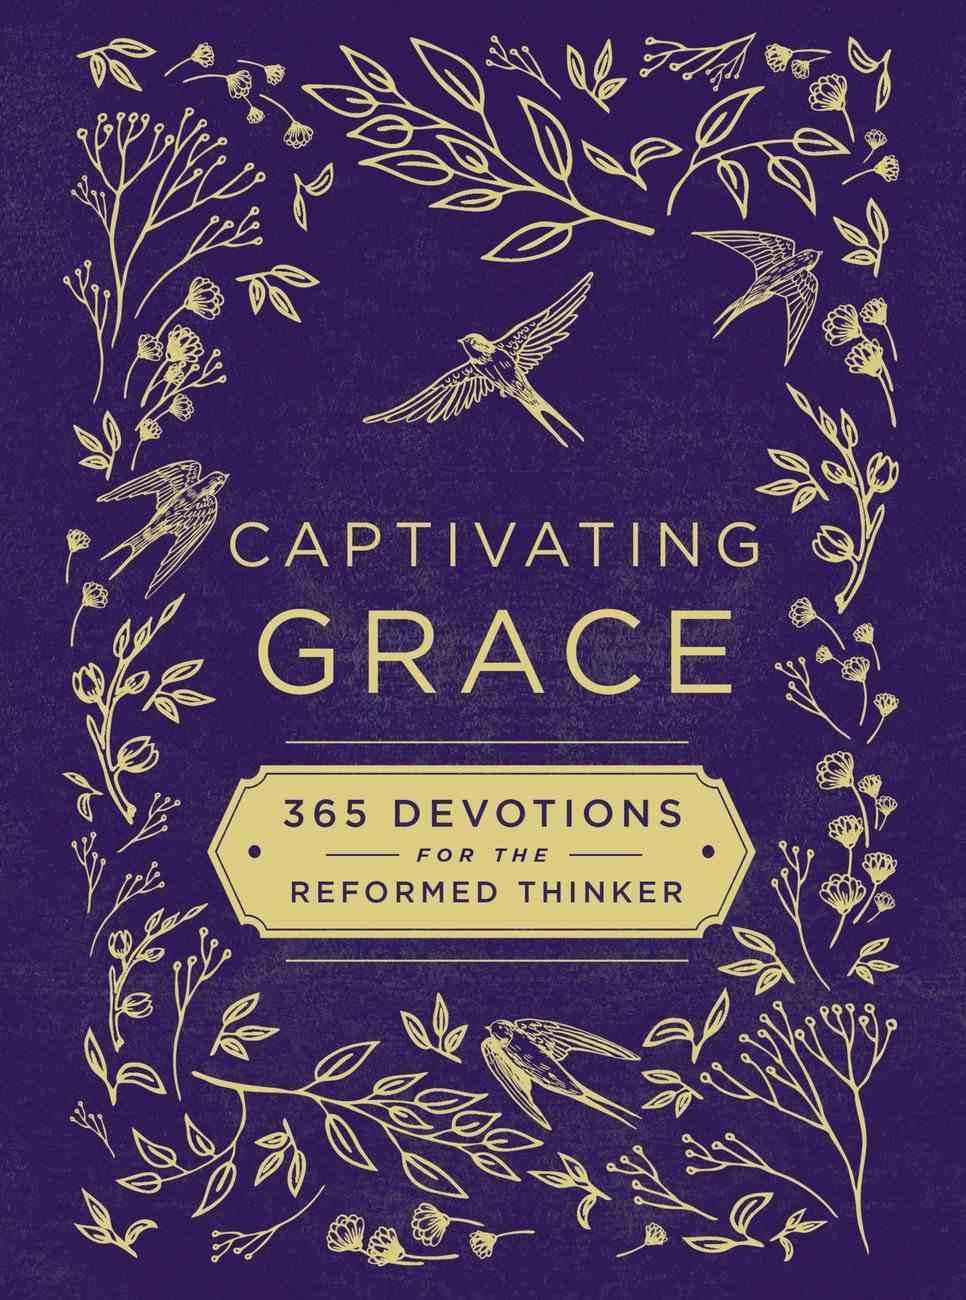 Captivating Grace: 365 Devotions For the Reformed Thinker Hardback